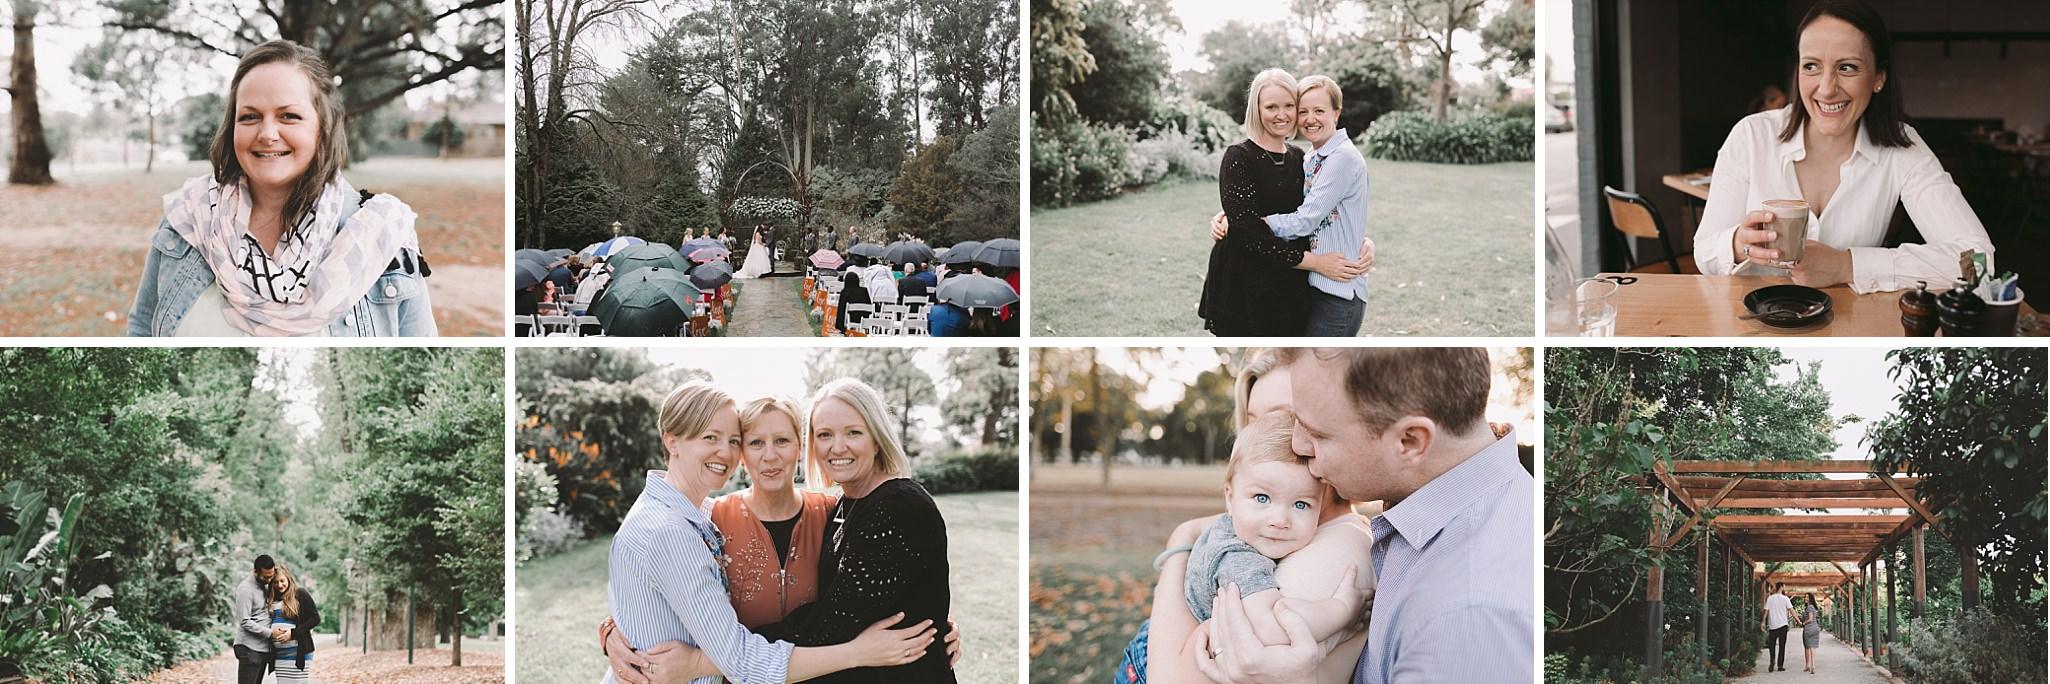 Lecinda Ward, Melbourne Family Newborn and Wedding Photographer_0111.jpg